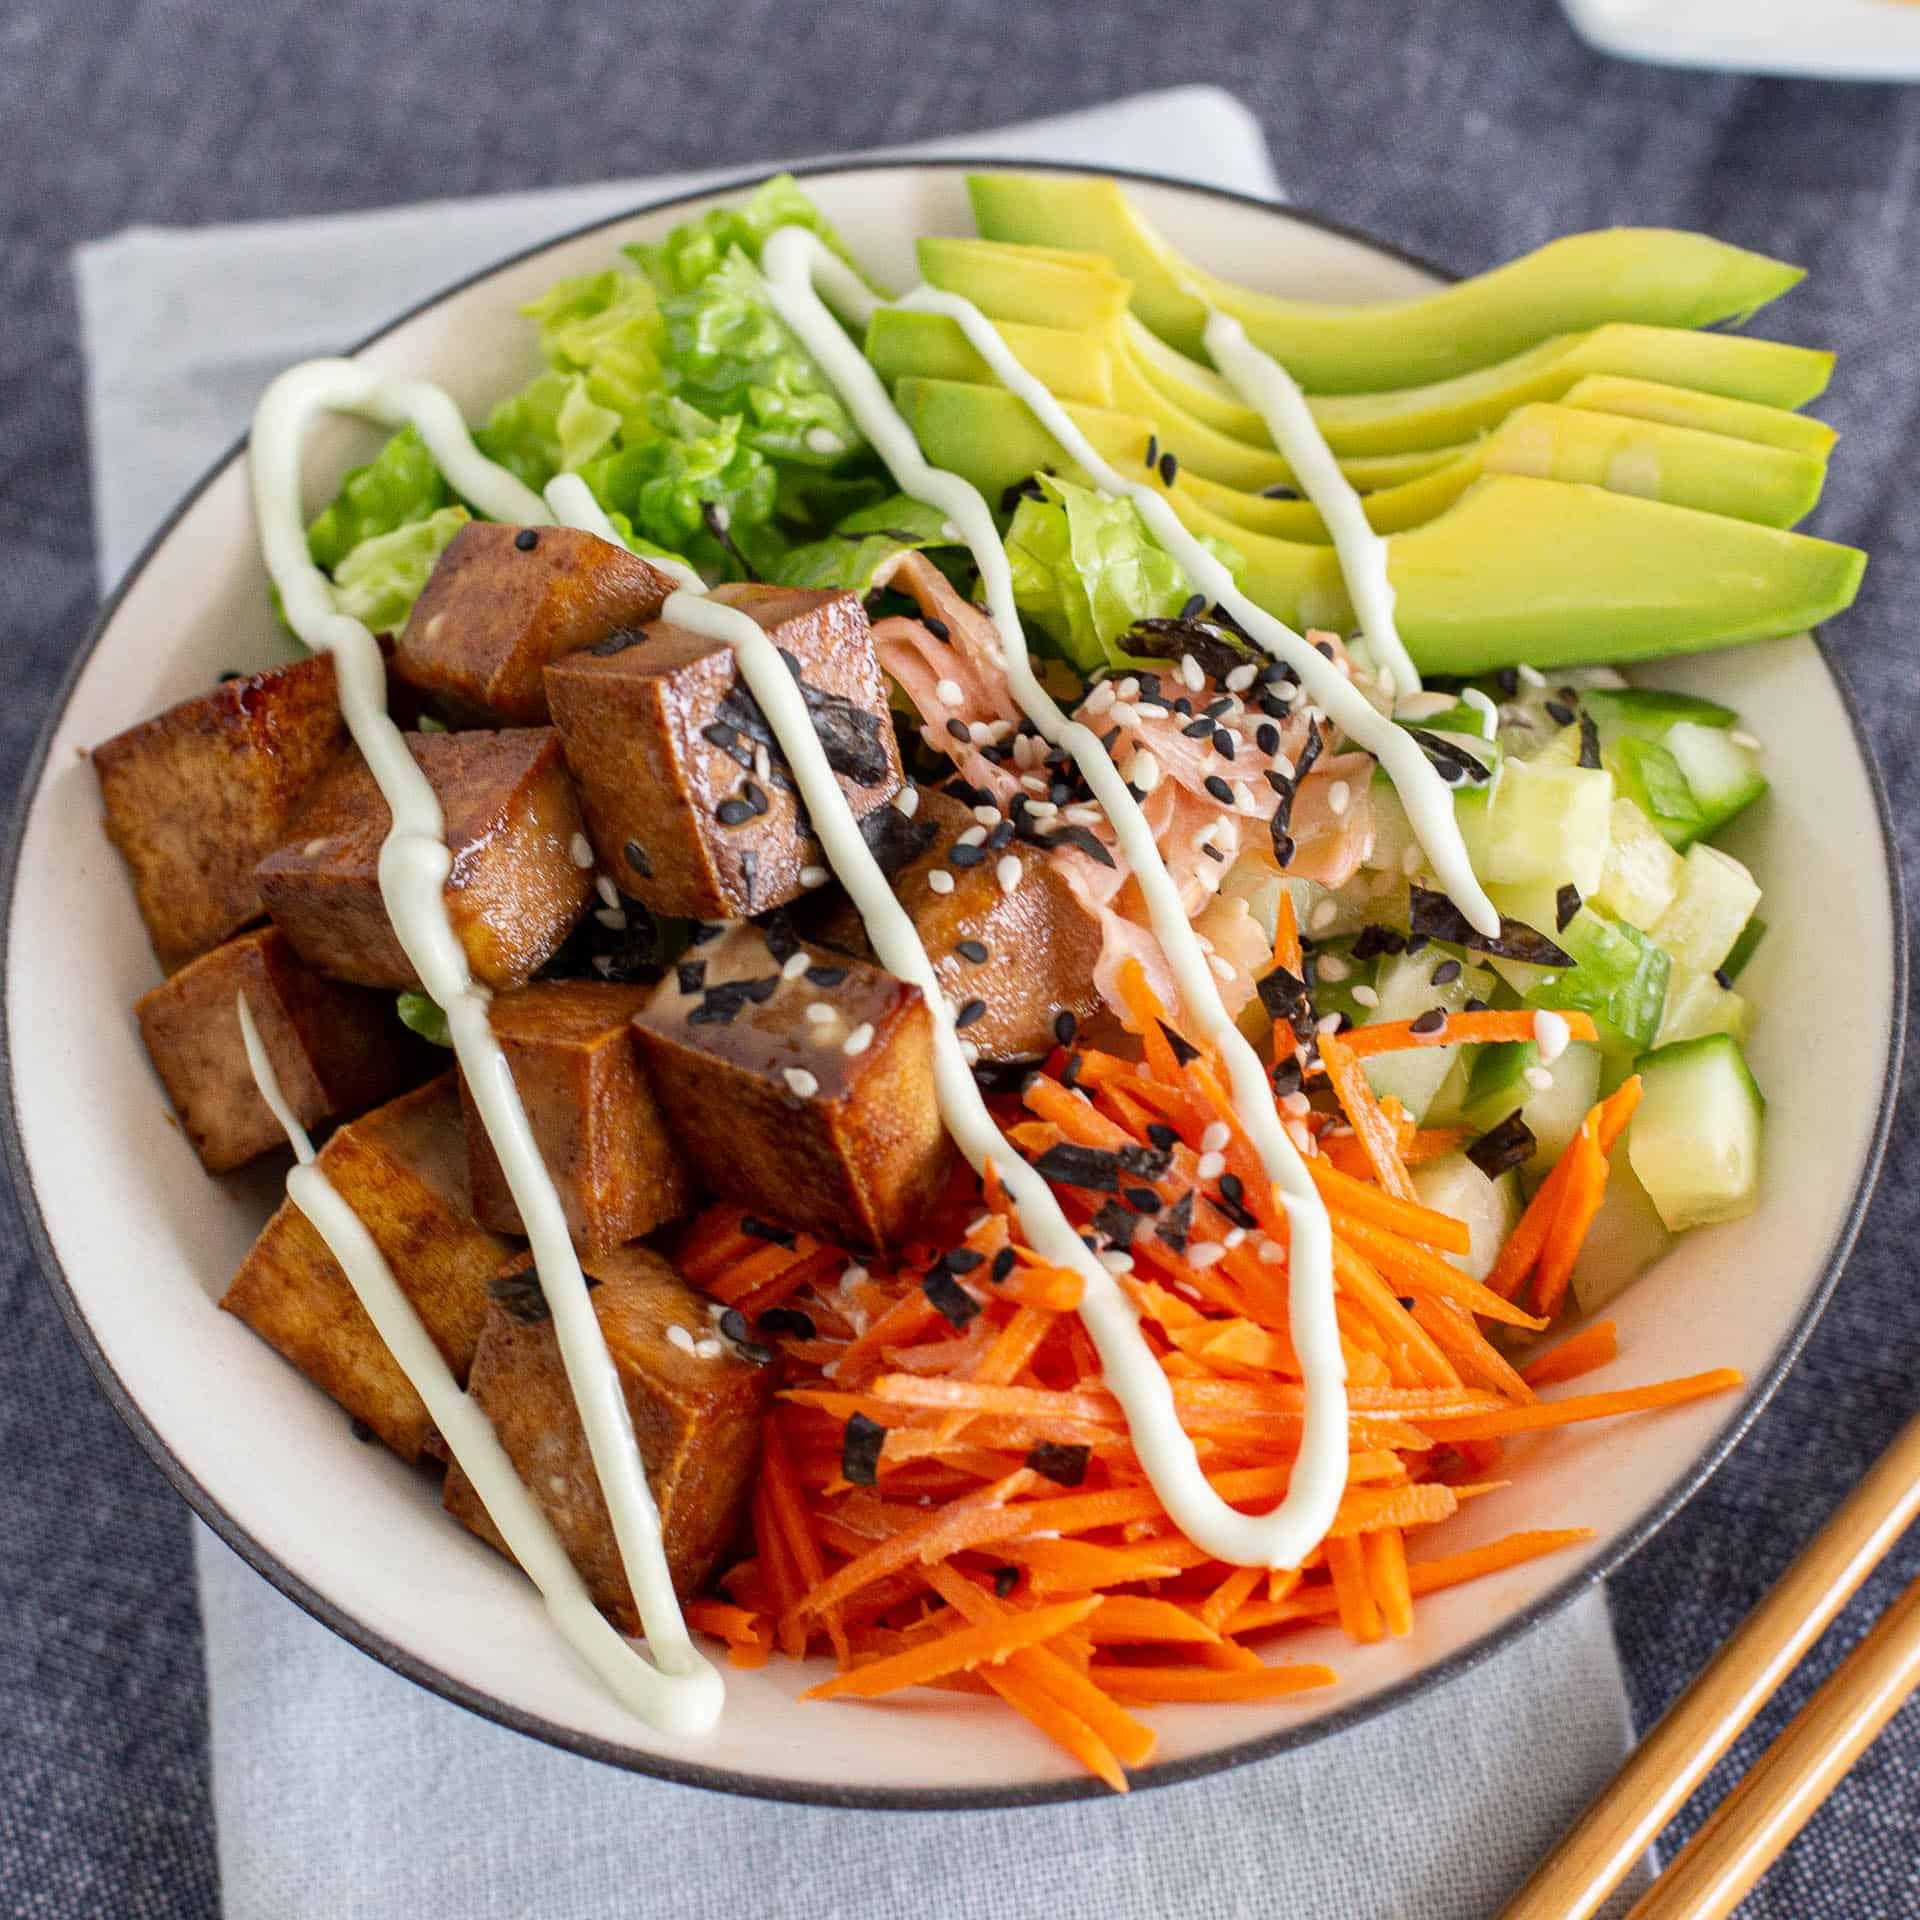 Close up shot of sushi bowl with teriyaki tofu and vegetables.